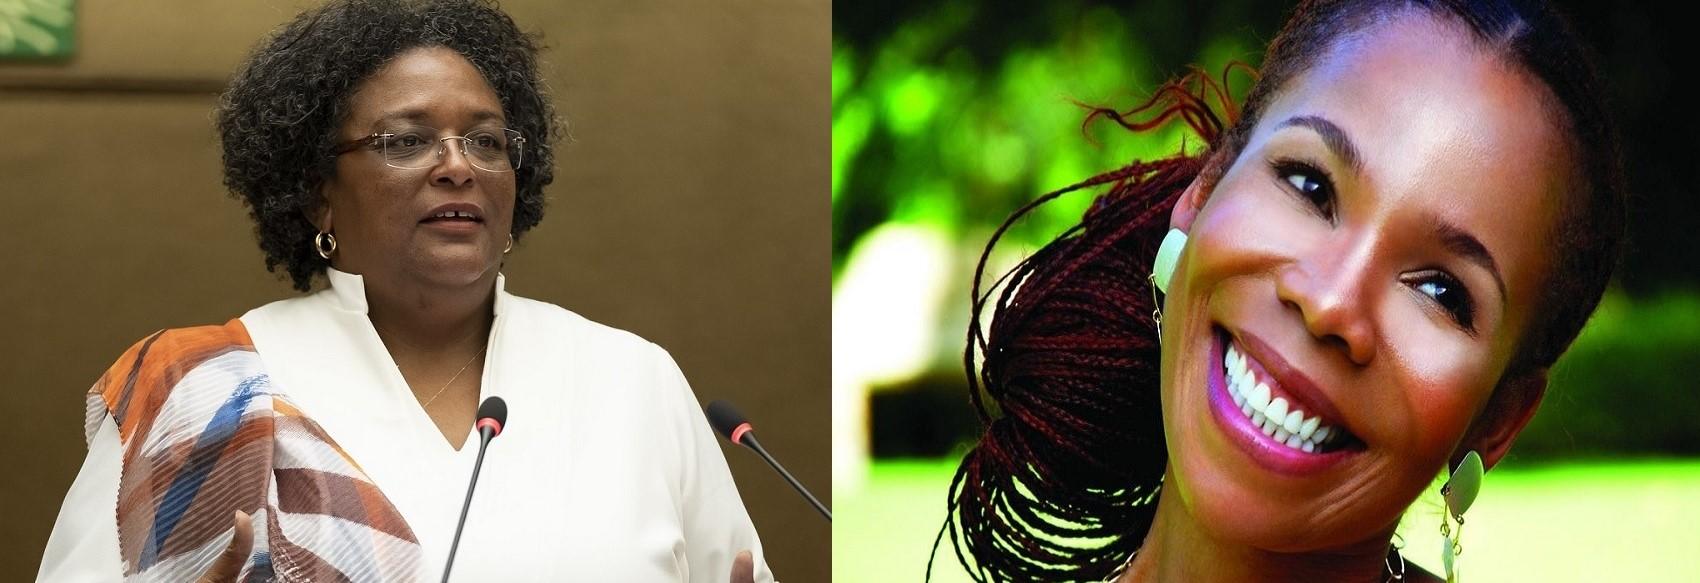 MIA MOTTLEY, CEDELLA MARLEY AMONGSEVEN AFUWI 2021 AWARDEES